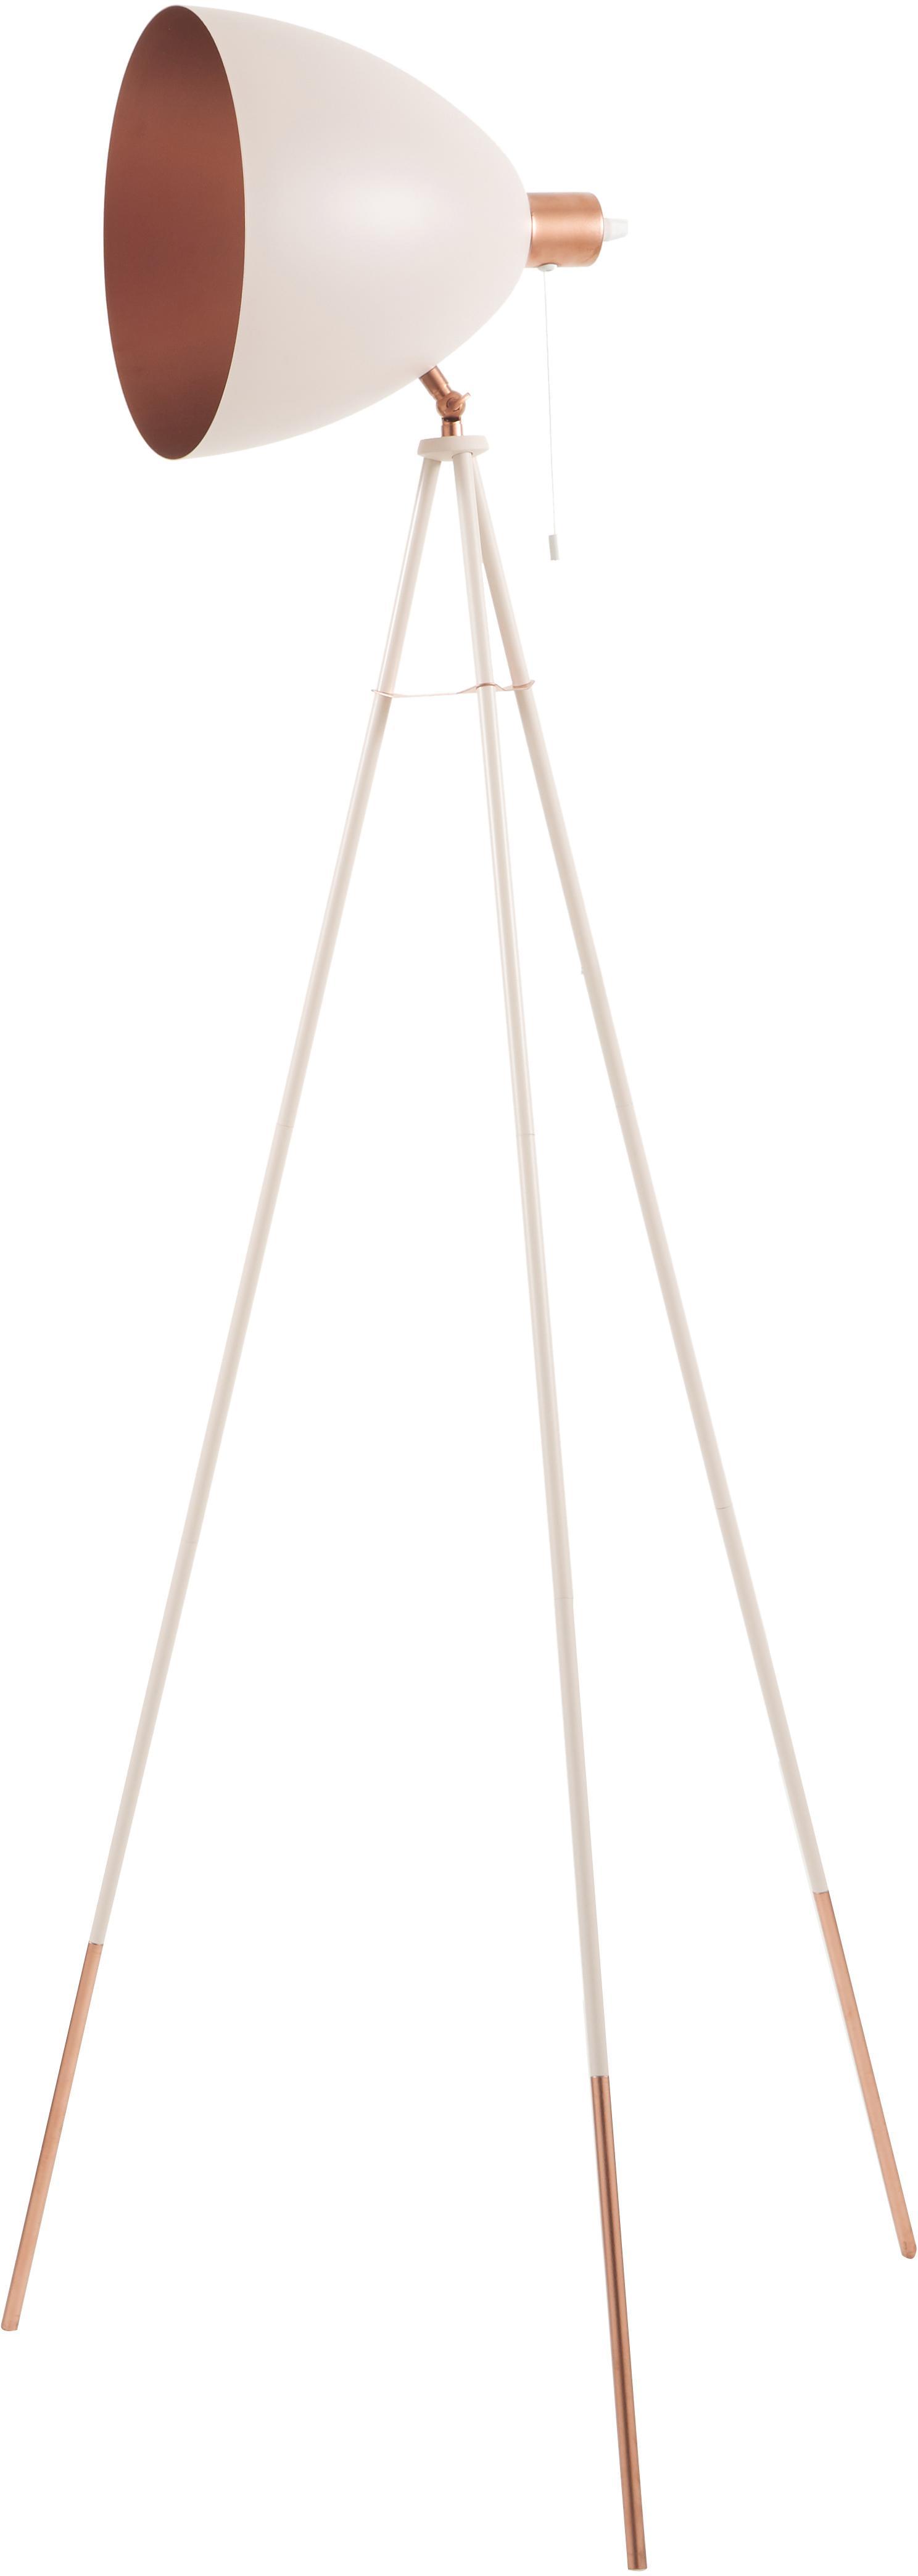 Tripod Leselampe Chester mit Kuper-Dekor, Lampenschirm: Stahl, lackiert, Rosa, Ø 60 x H 135 cm